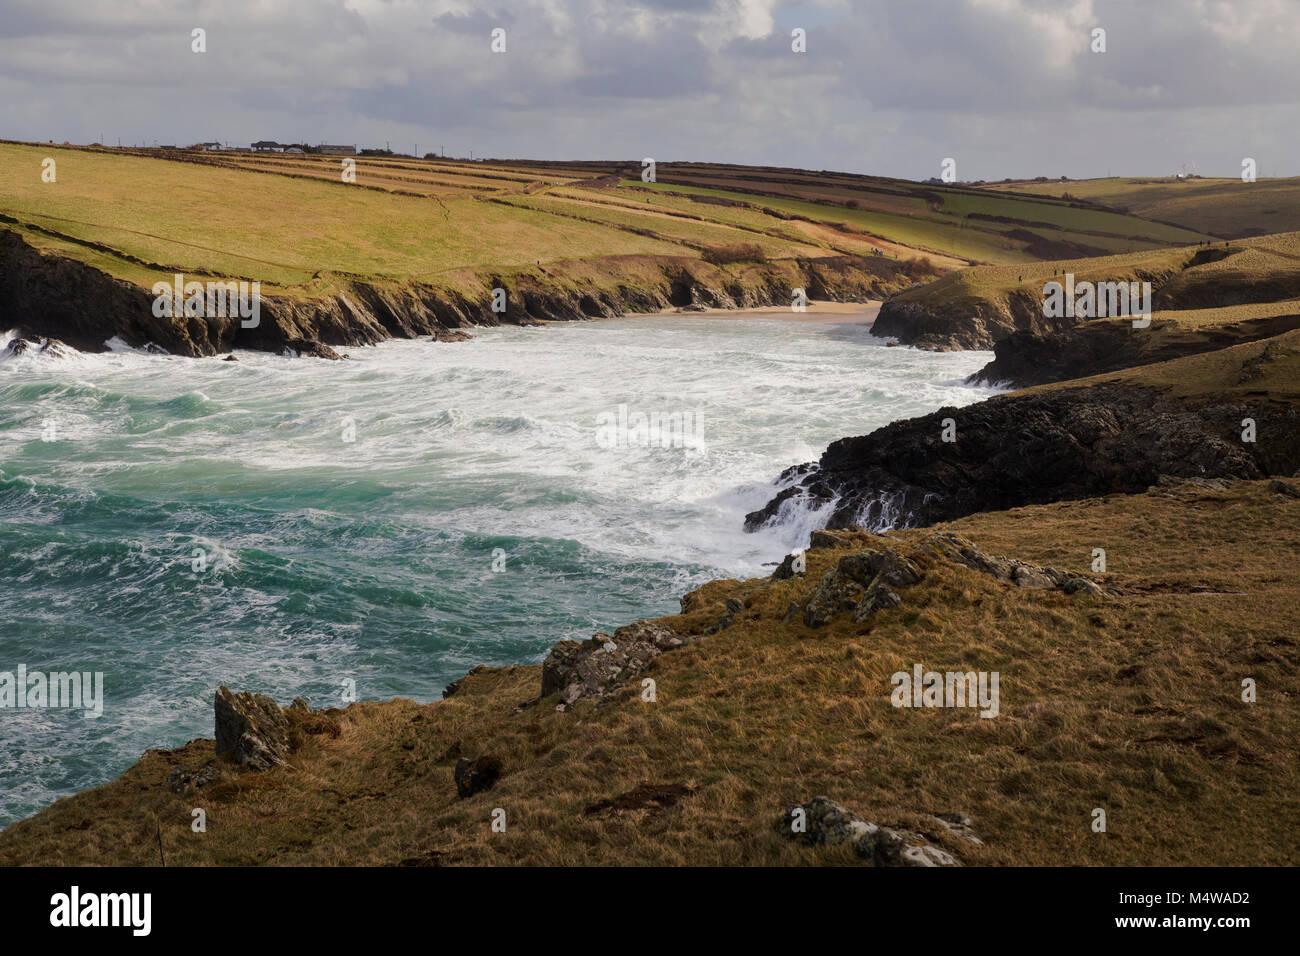 Beautiful Cornish seascape showing sea and rugged coastline of Cornwall. - Stock Image